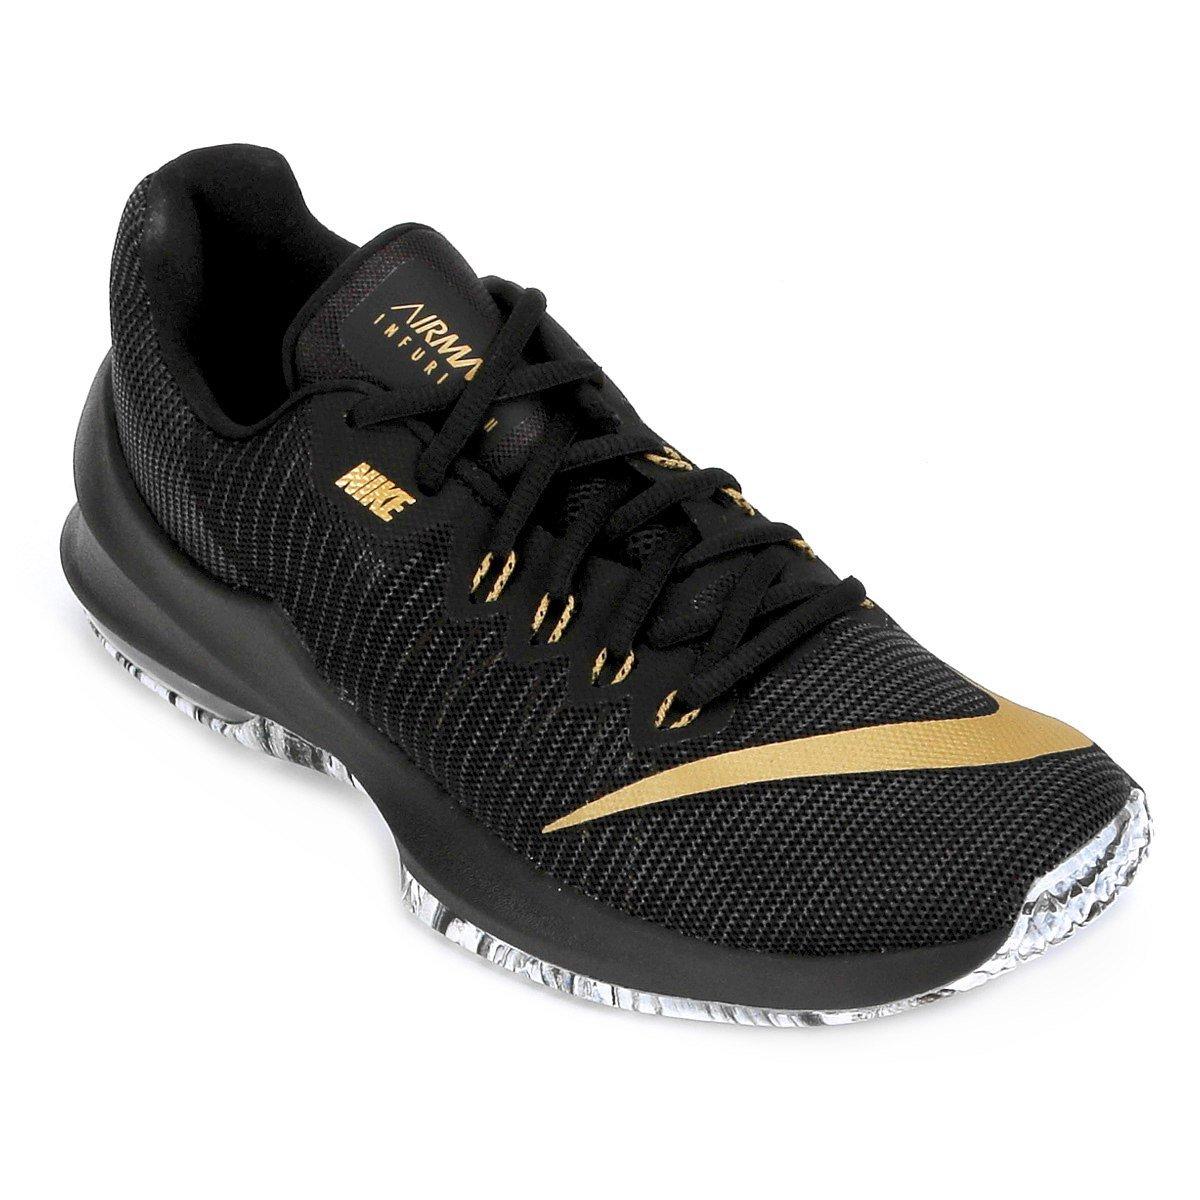 9bdc351e5ae20 Tênis Masculino Nike Air Max Infuriate 2 Low 908975-090 Preto Dourado